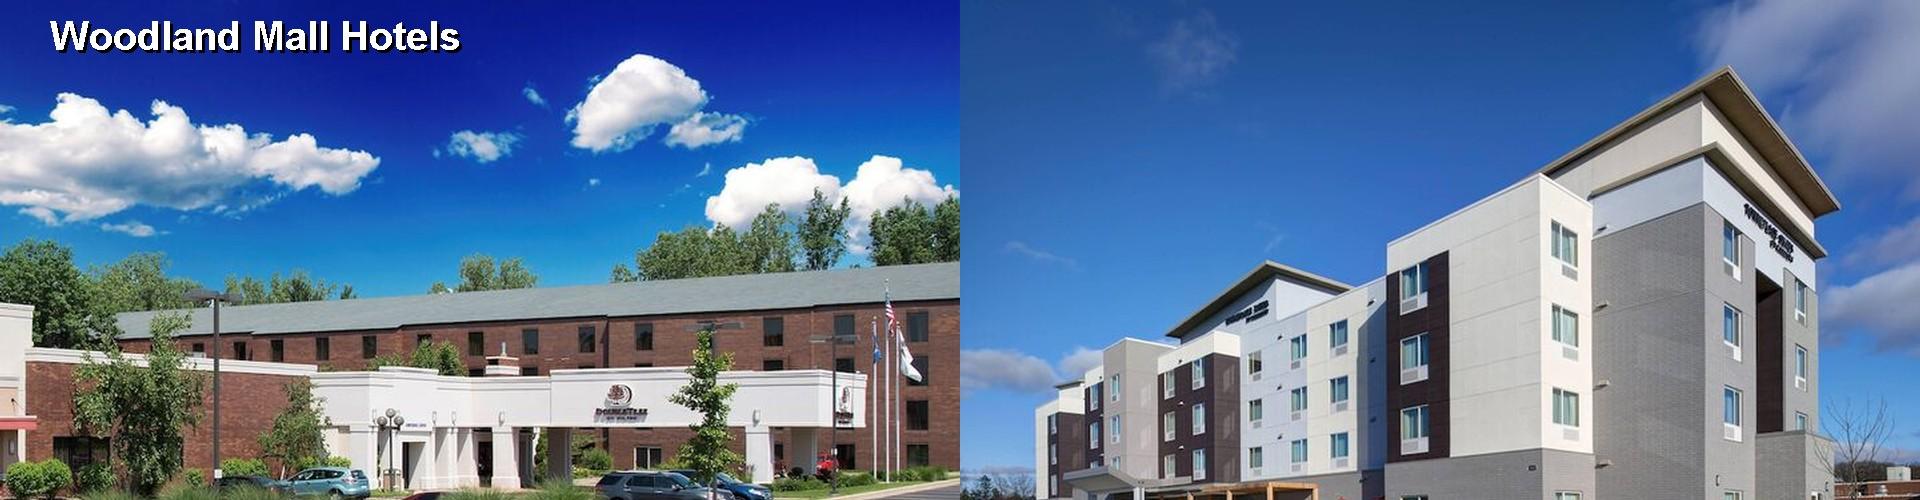 5 Best Hotels Near Woodland Mall